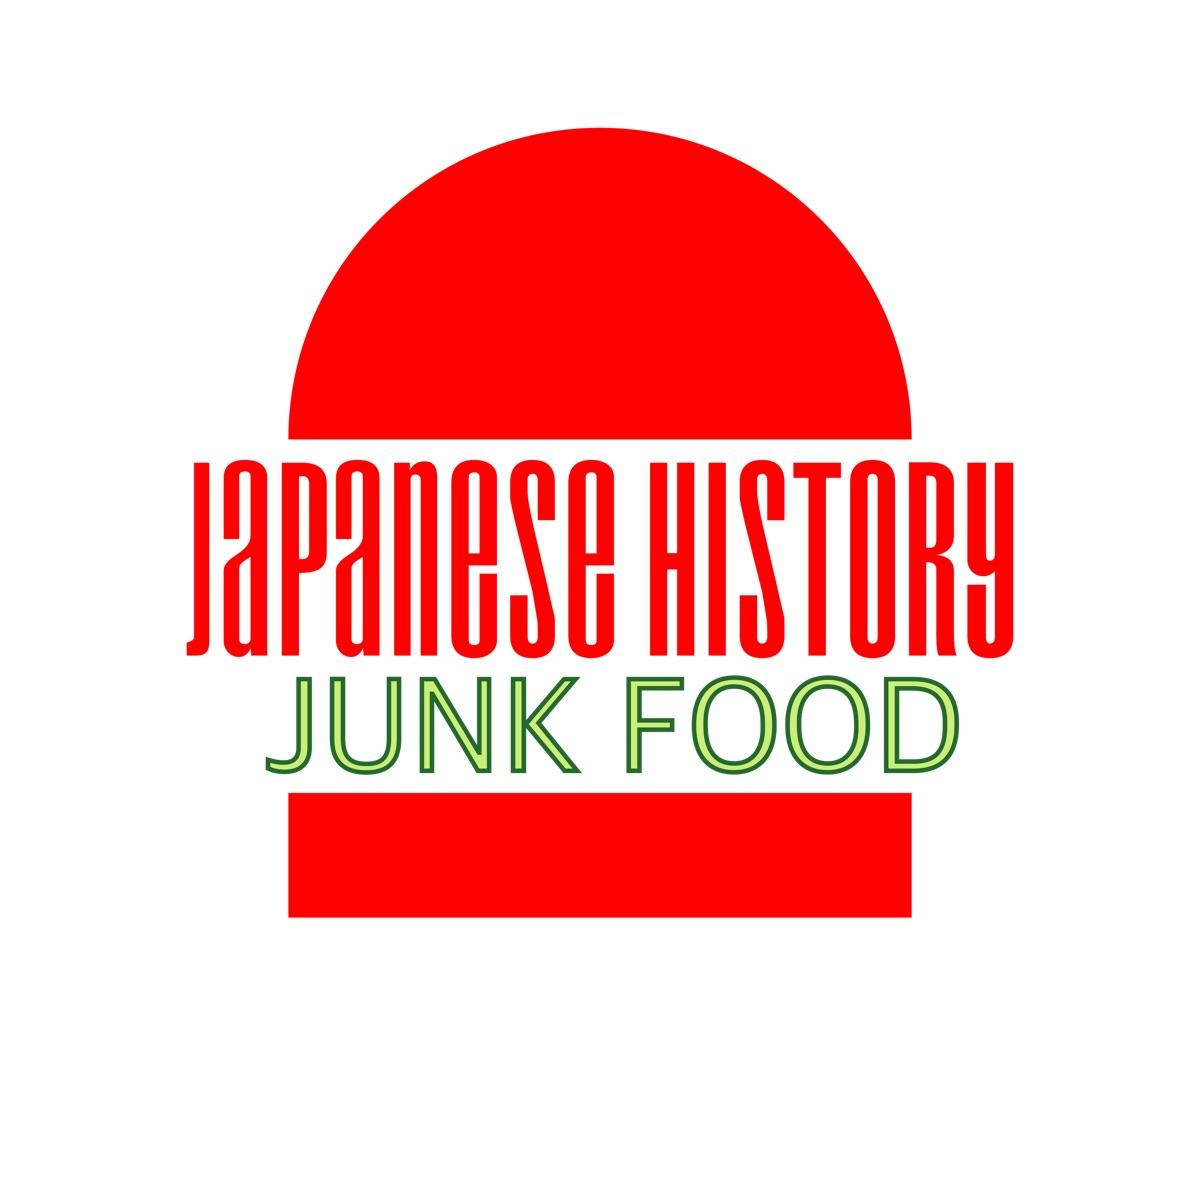 Japanese History Junk Food